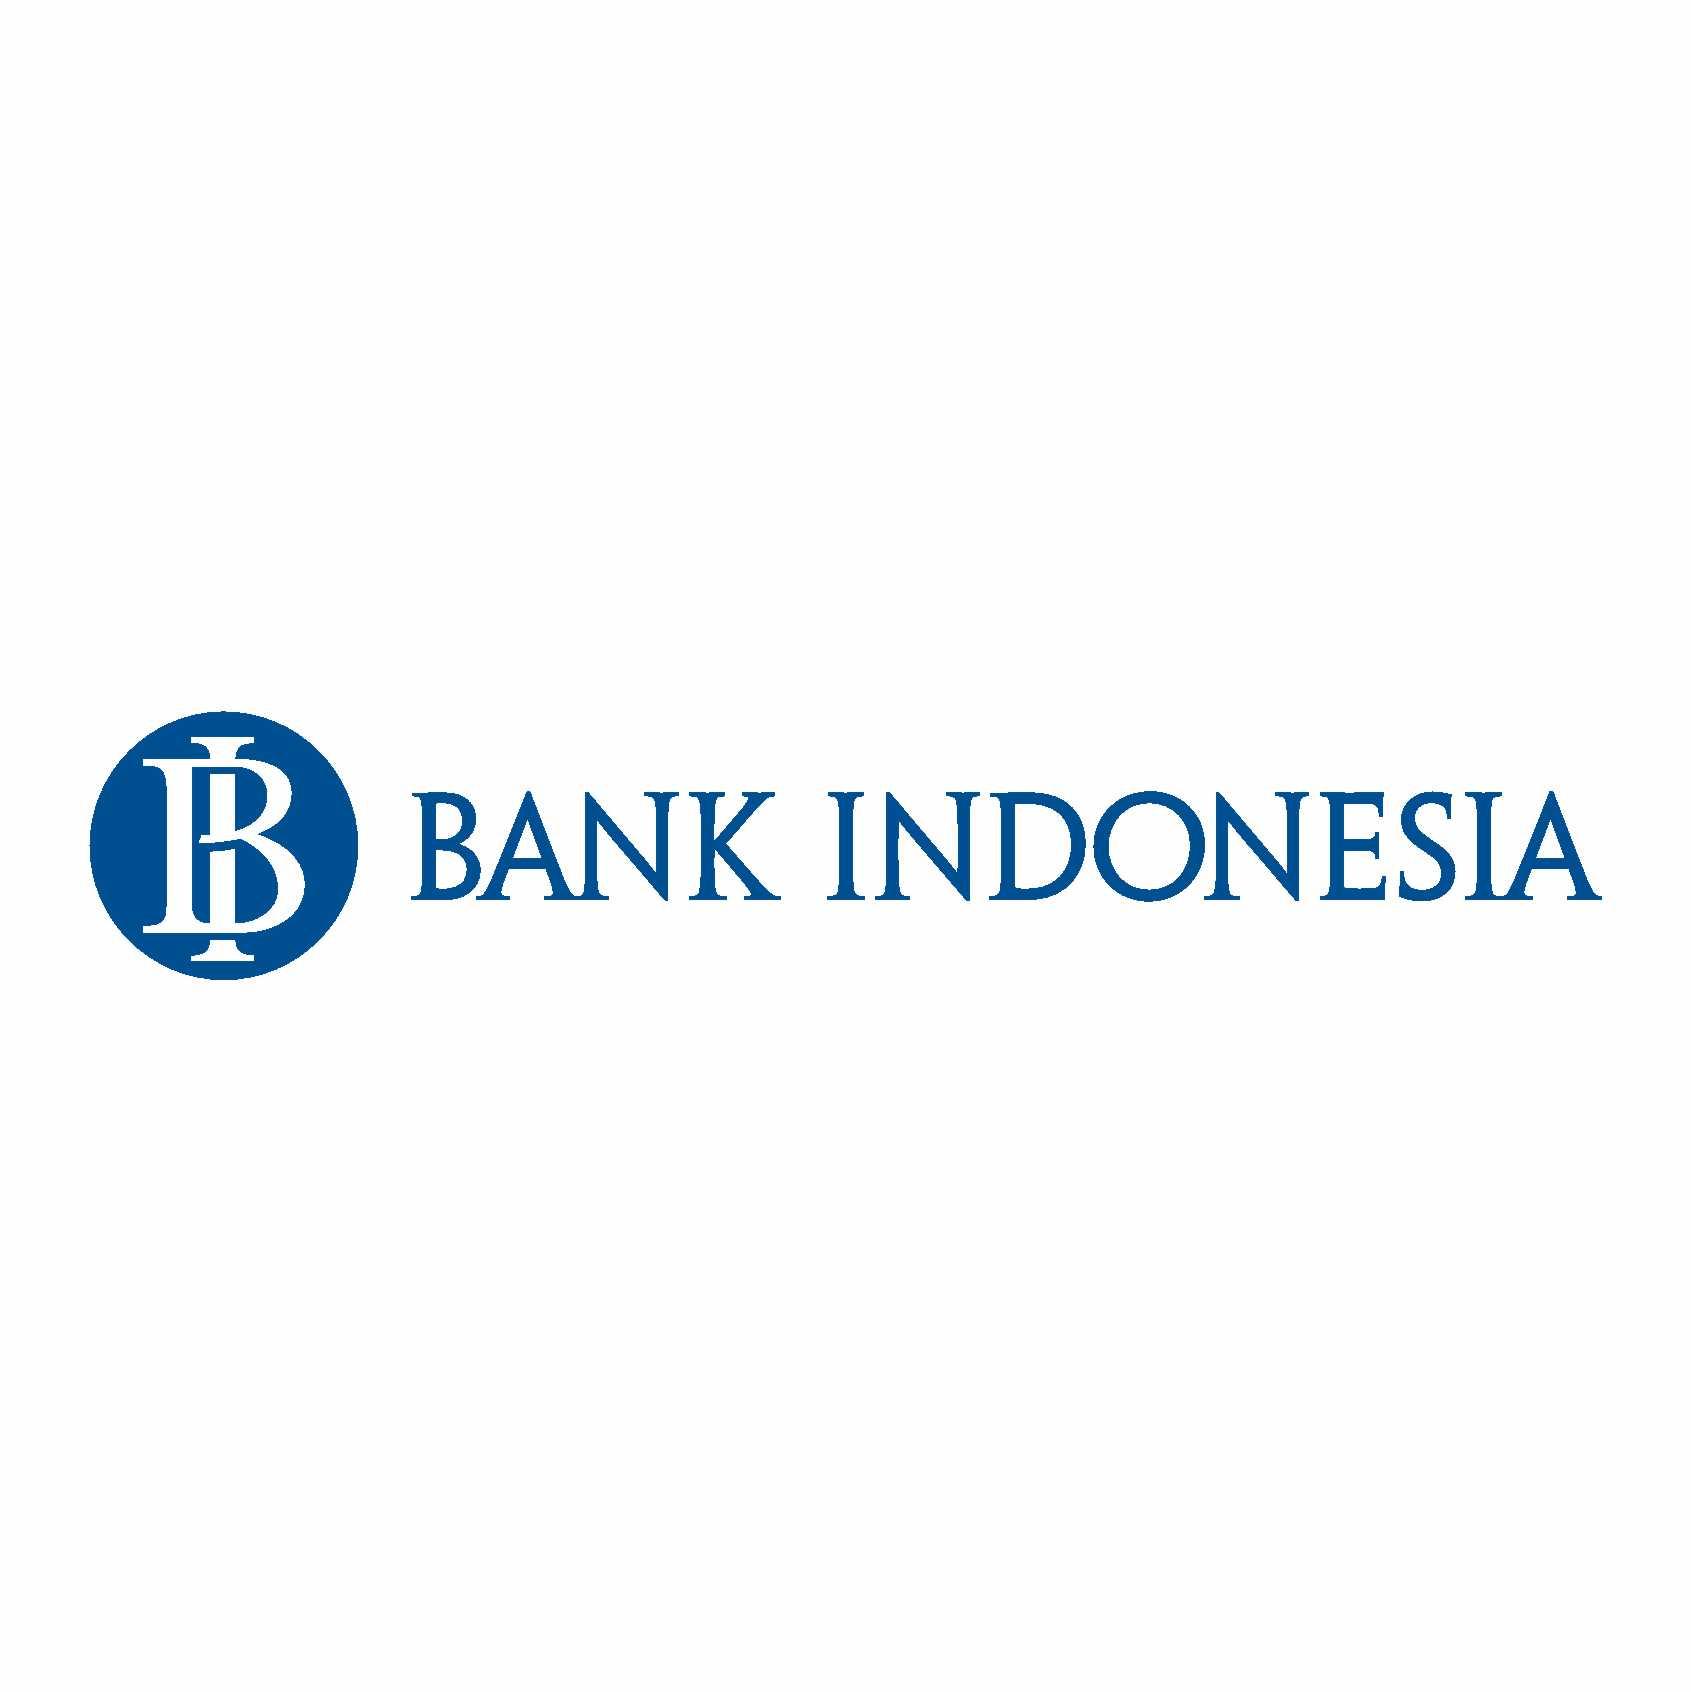 bank indonesia paketseminar